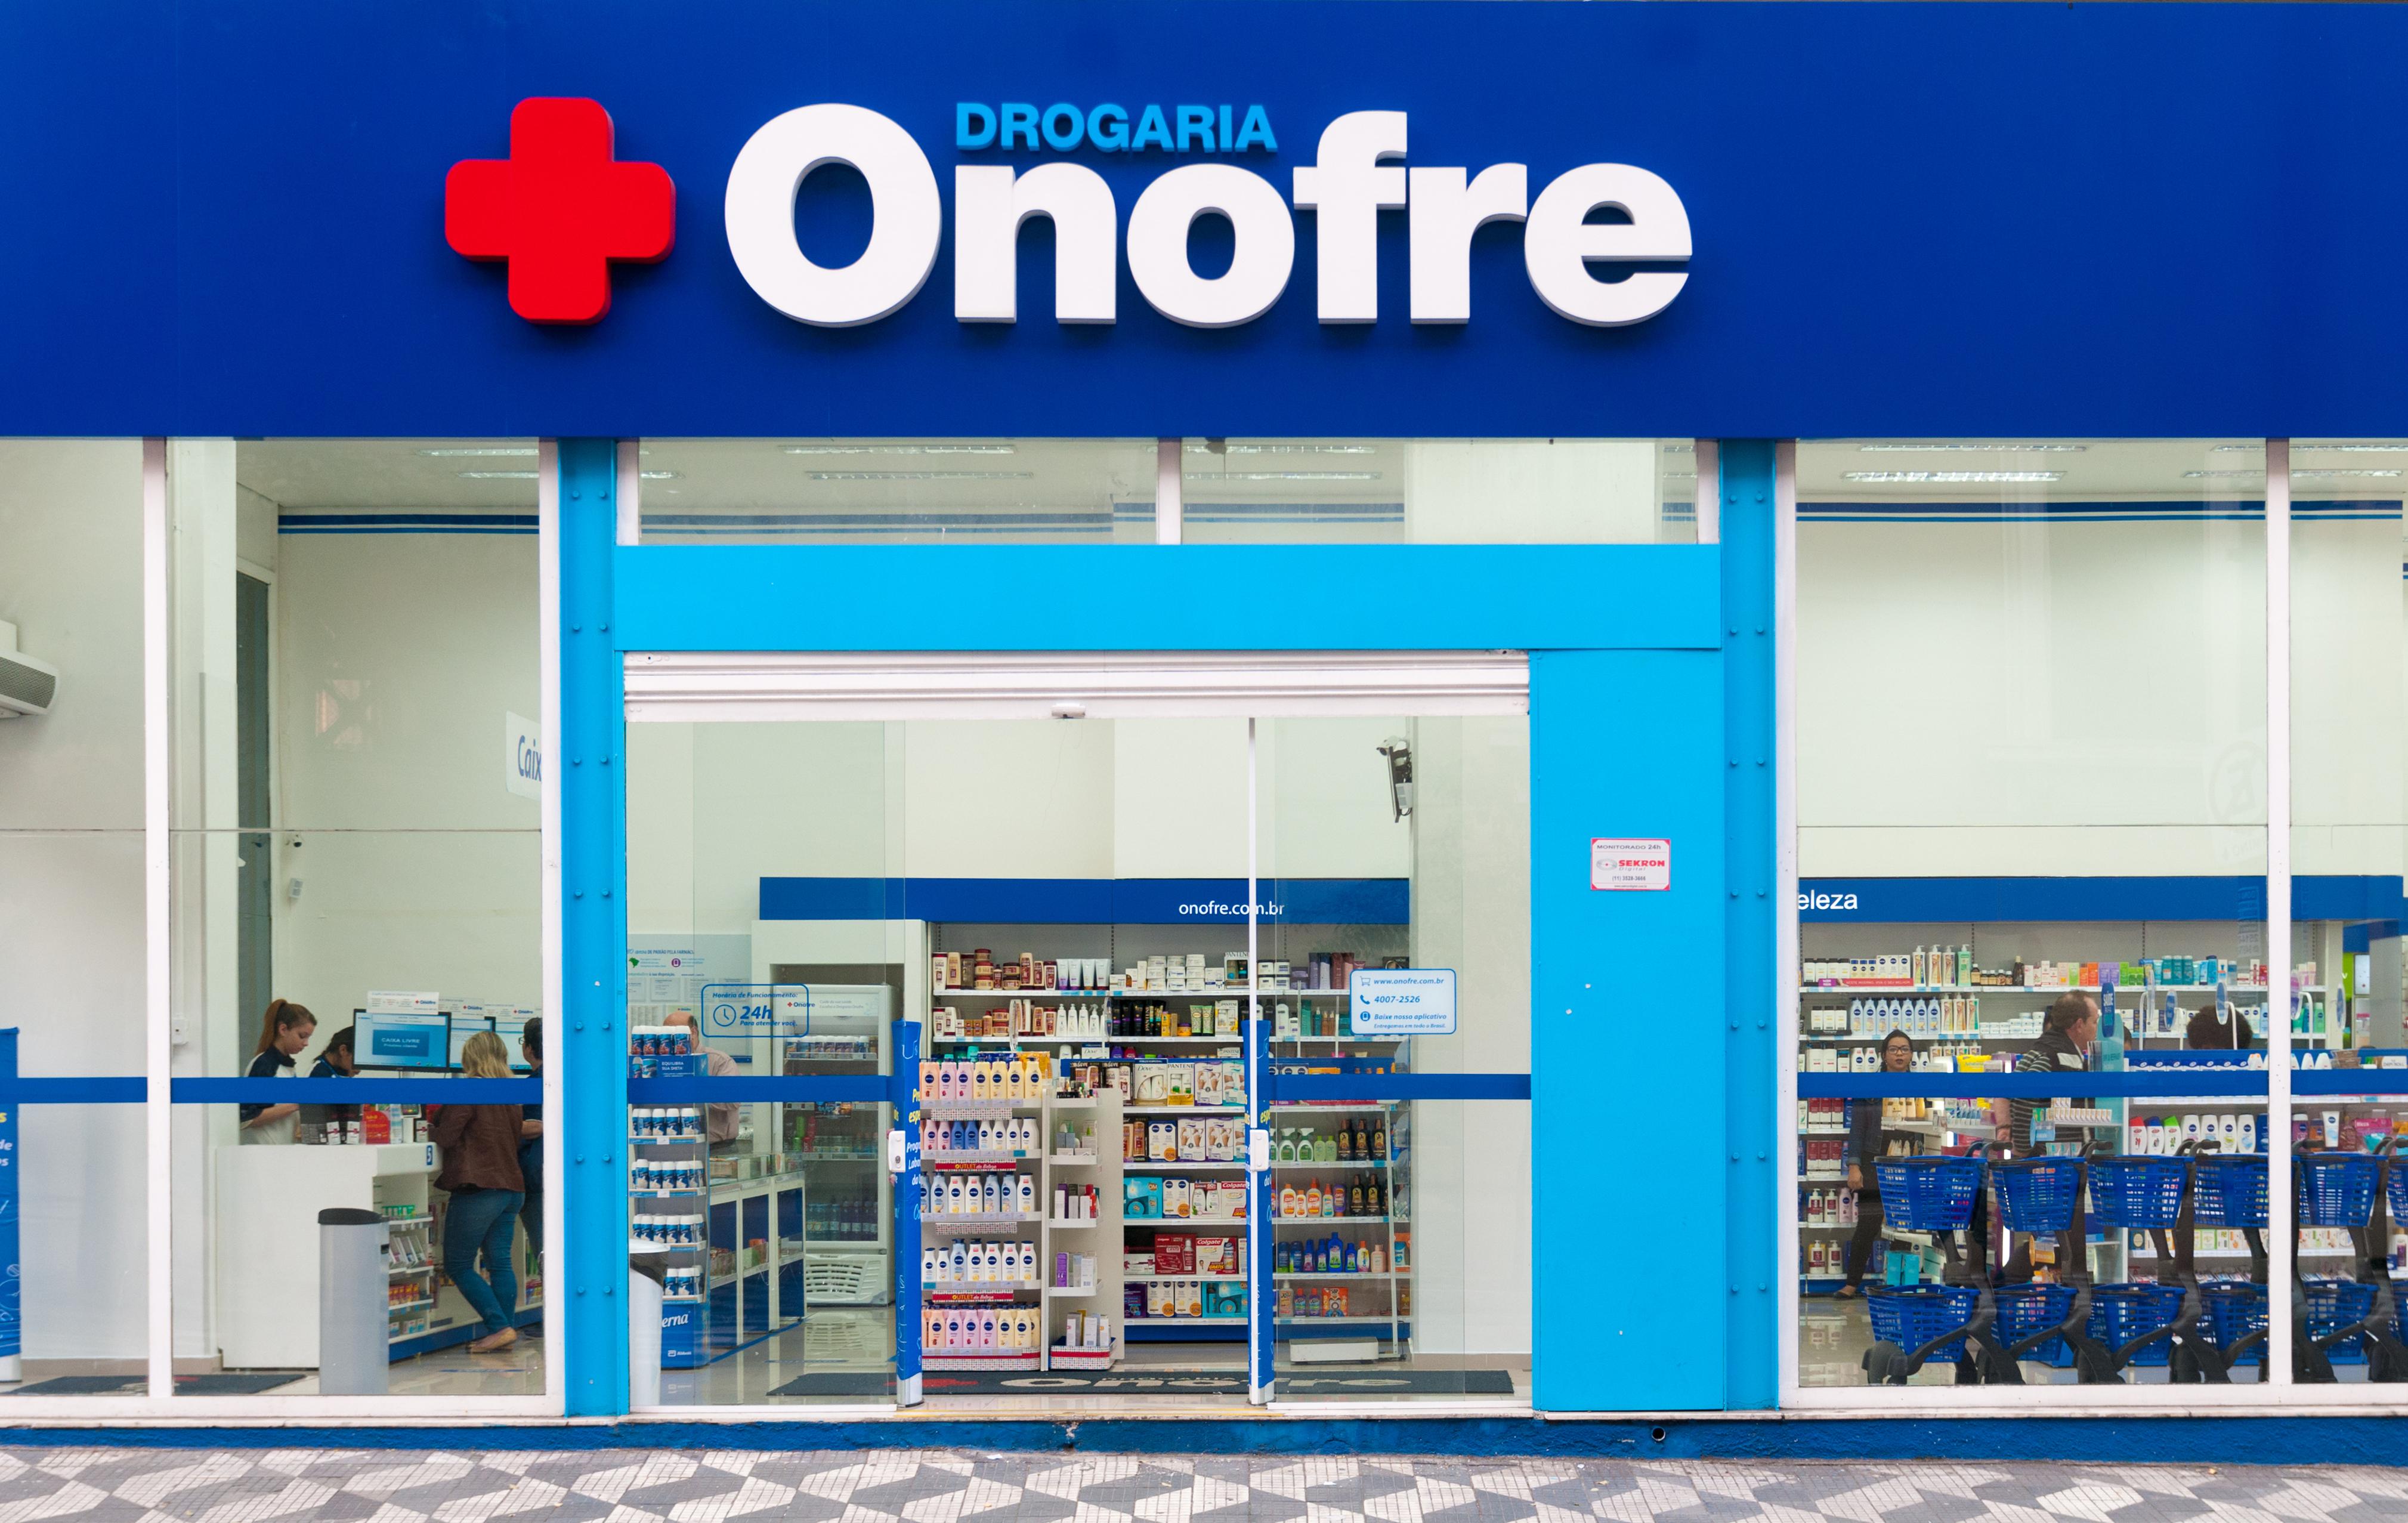 2e6f47269bd Drogaria Onofre – Wikipédia